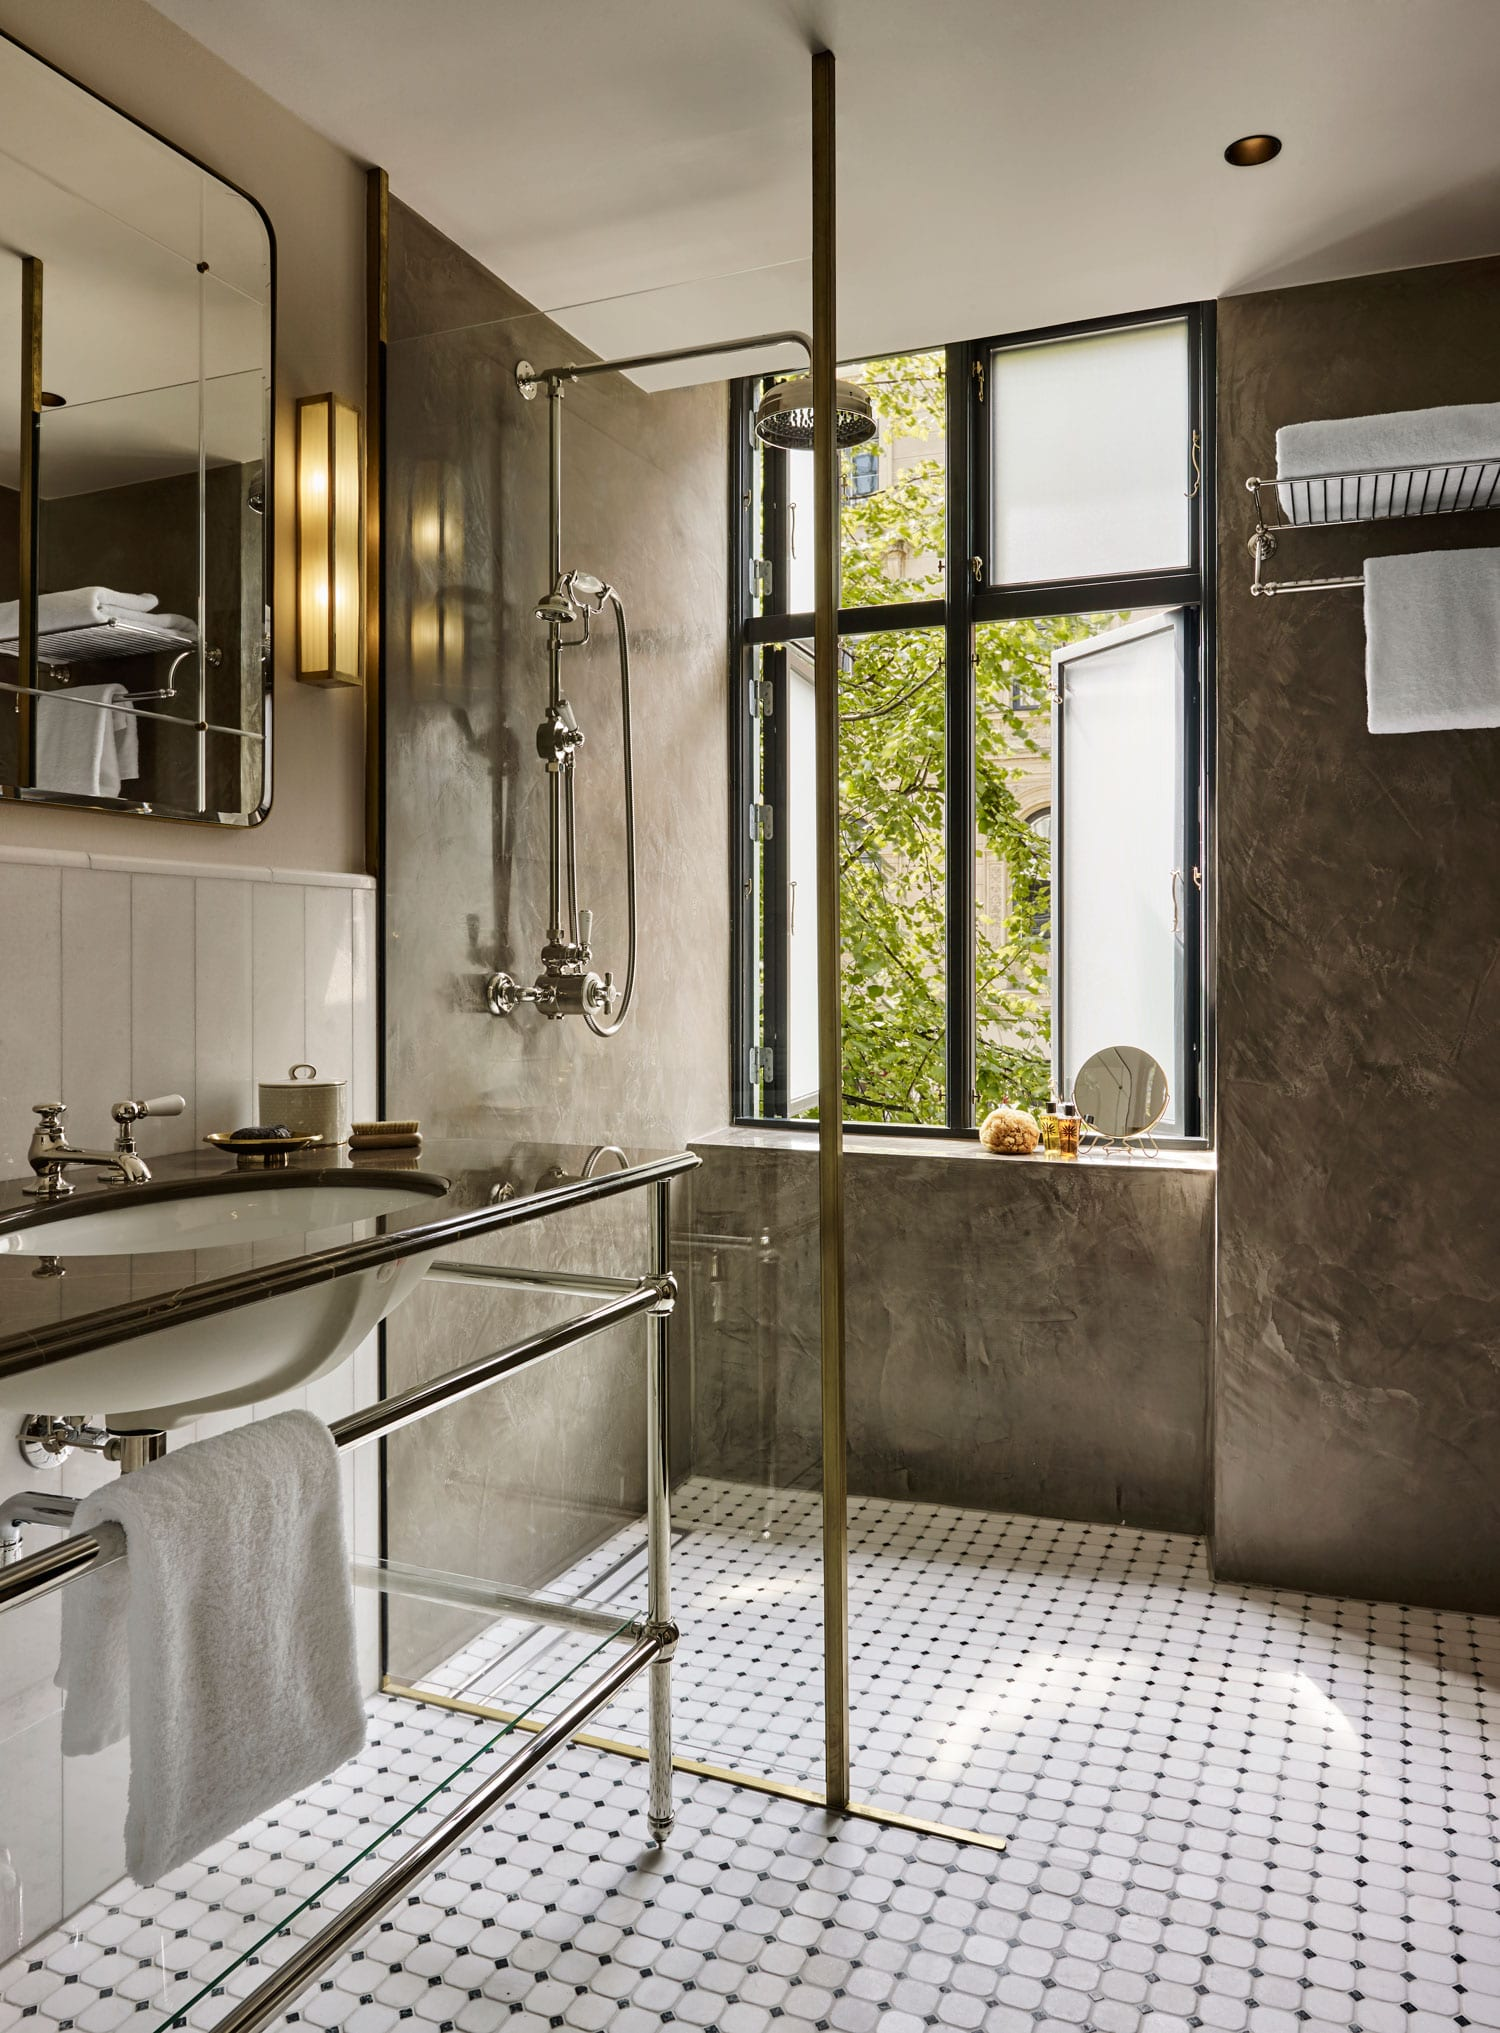 Sanders boutique hotel in copenhagen by lind almond for Design boutique hotels copenhagen